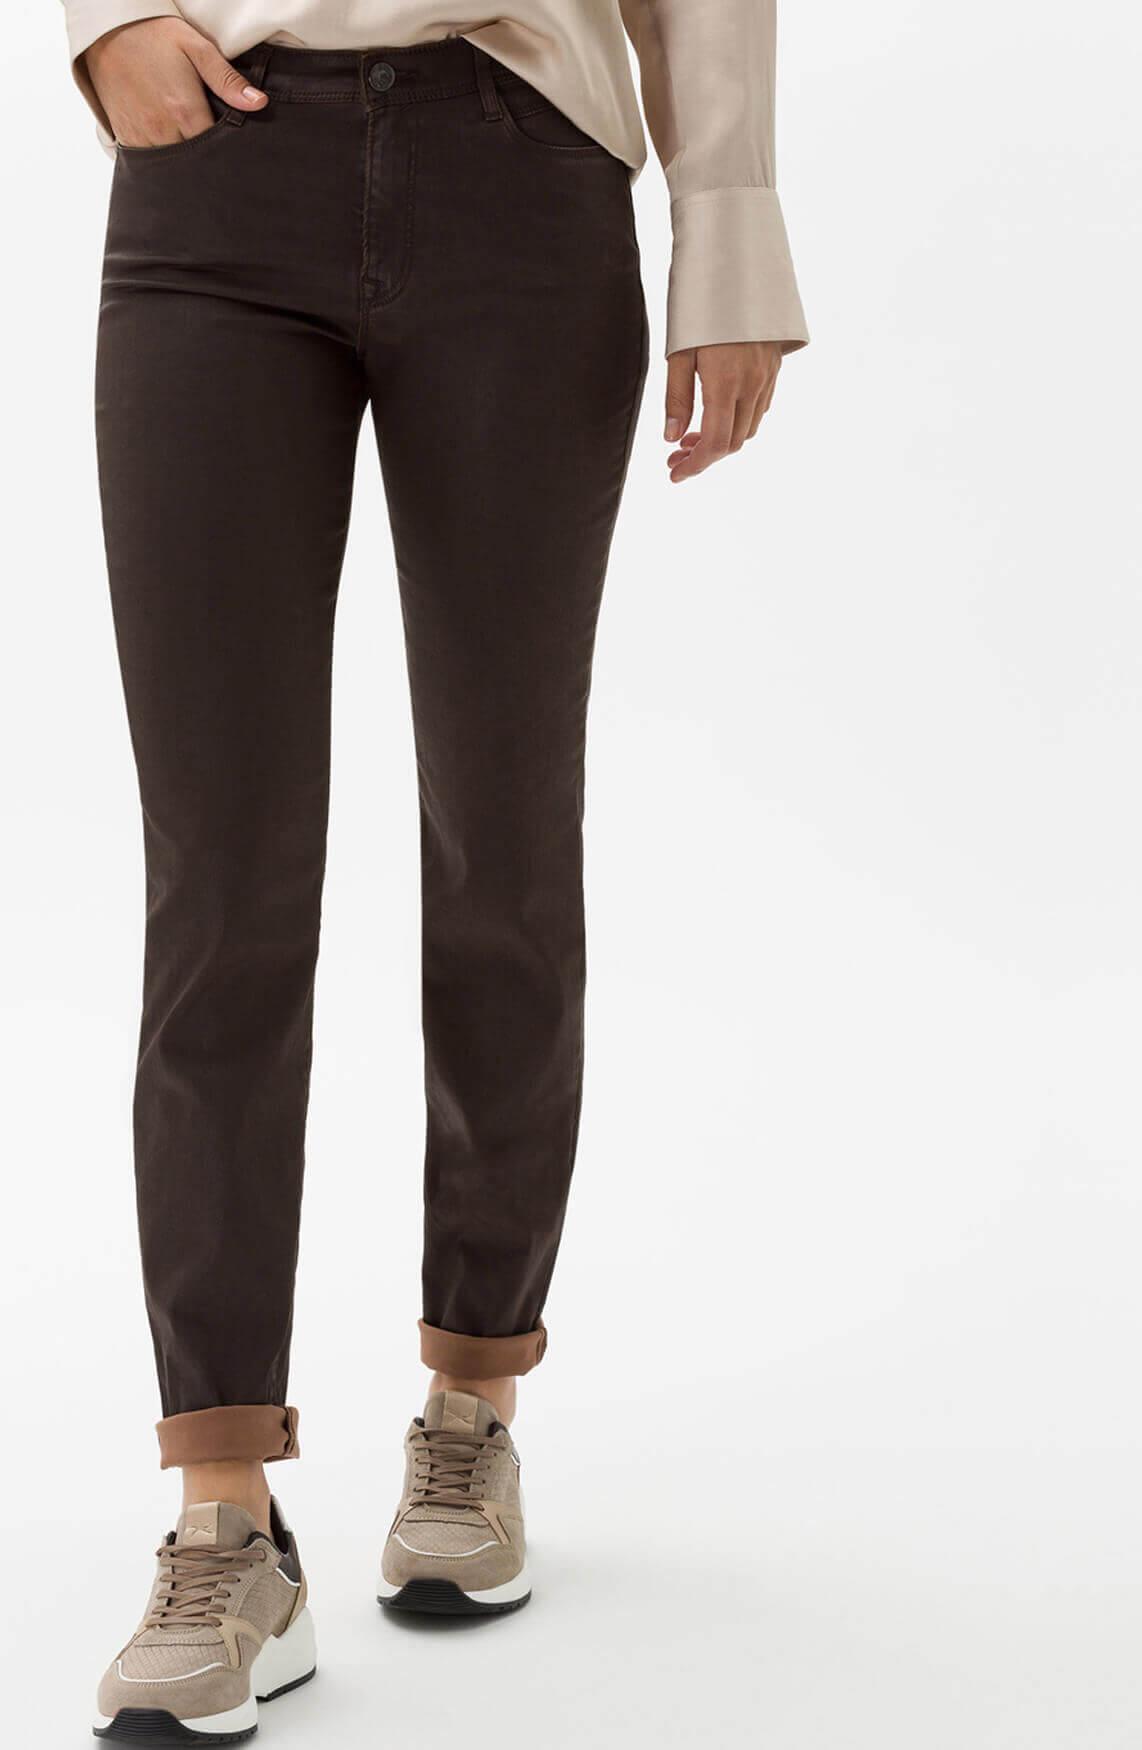 Brax Dames Shakira gecoate jeans Bruin